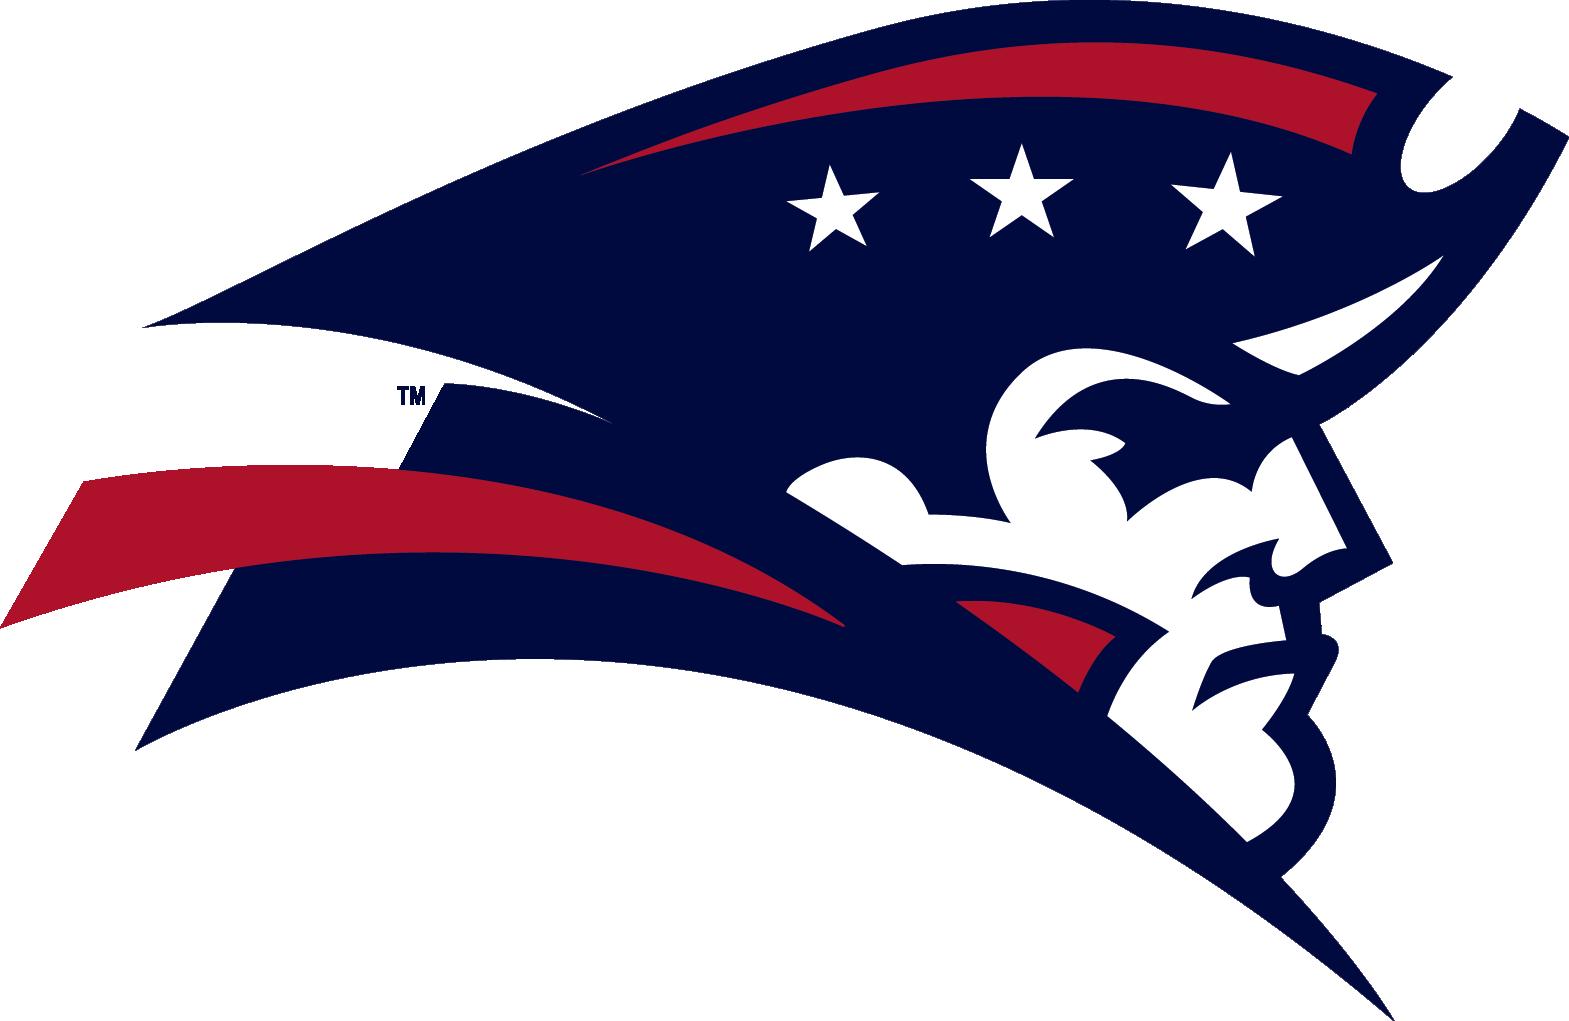 CHS Patriot logo